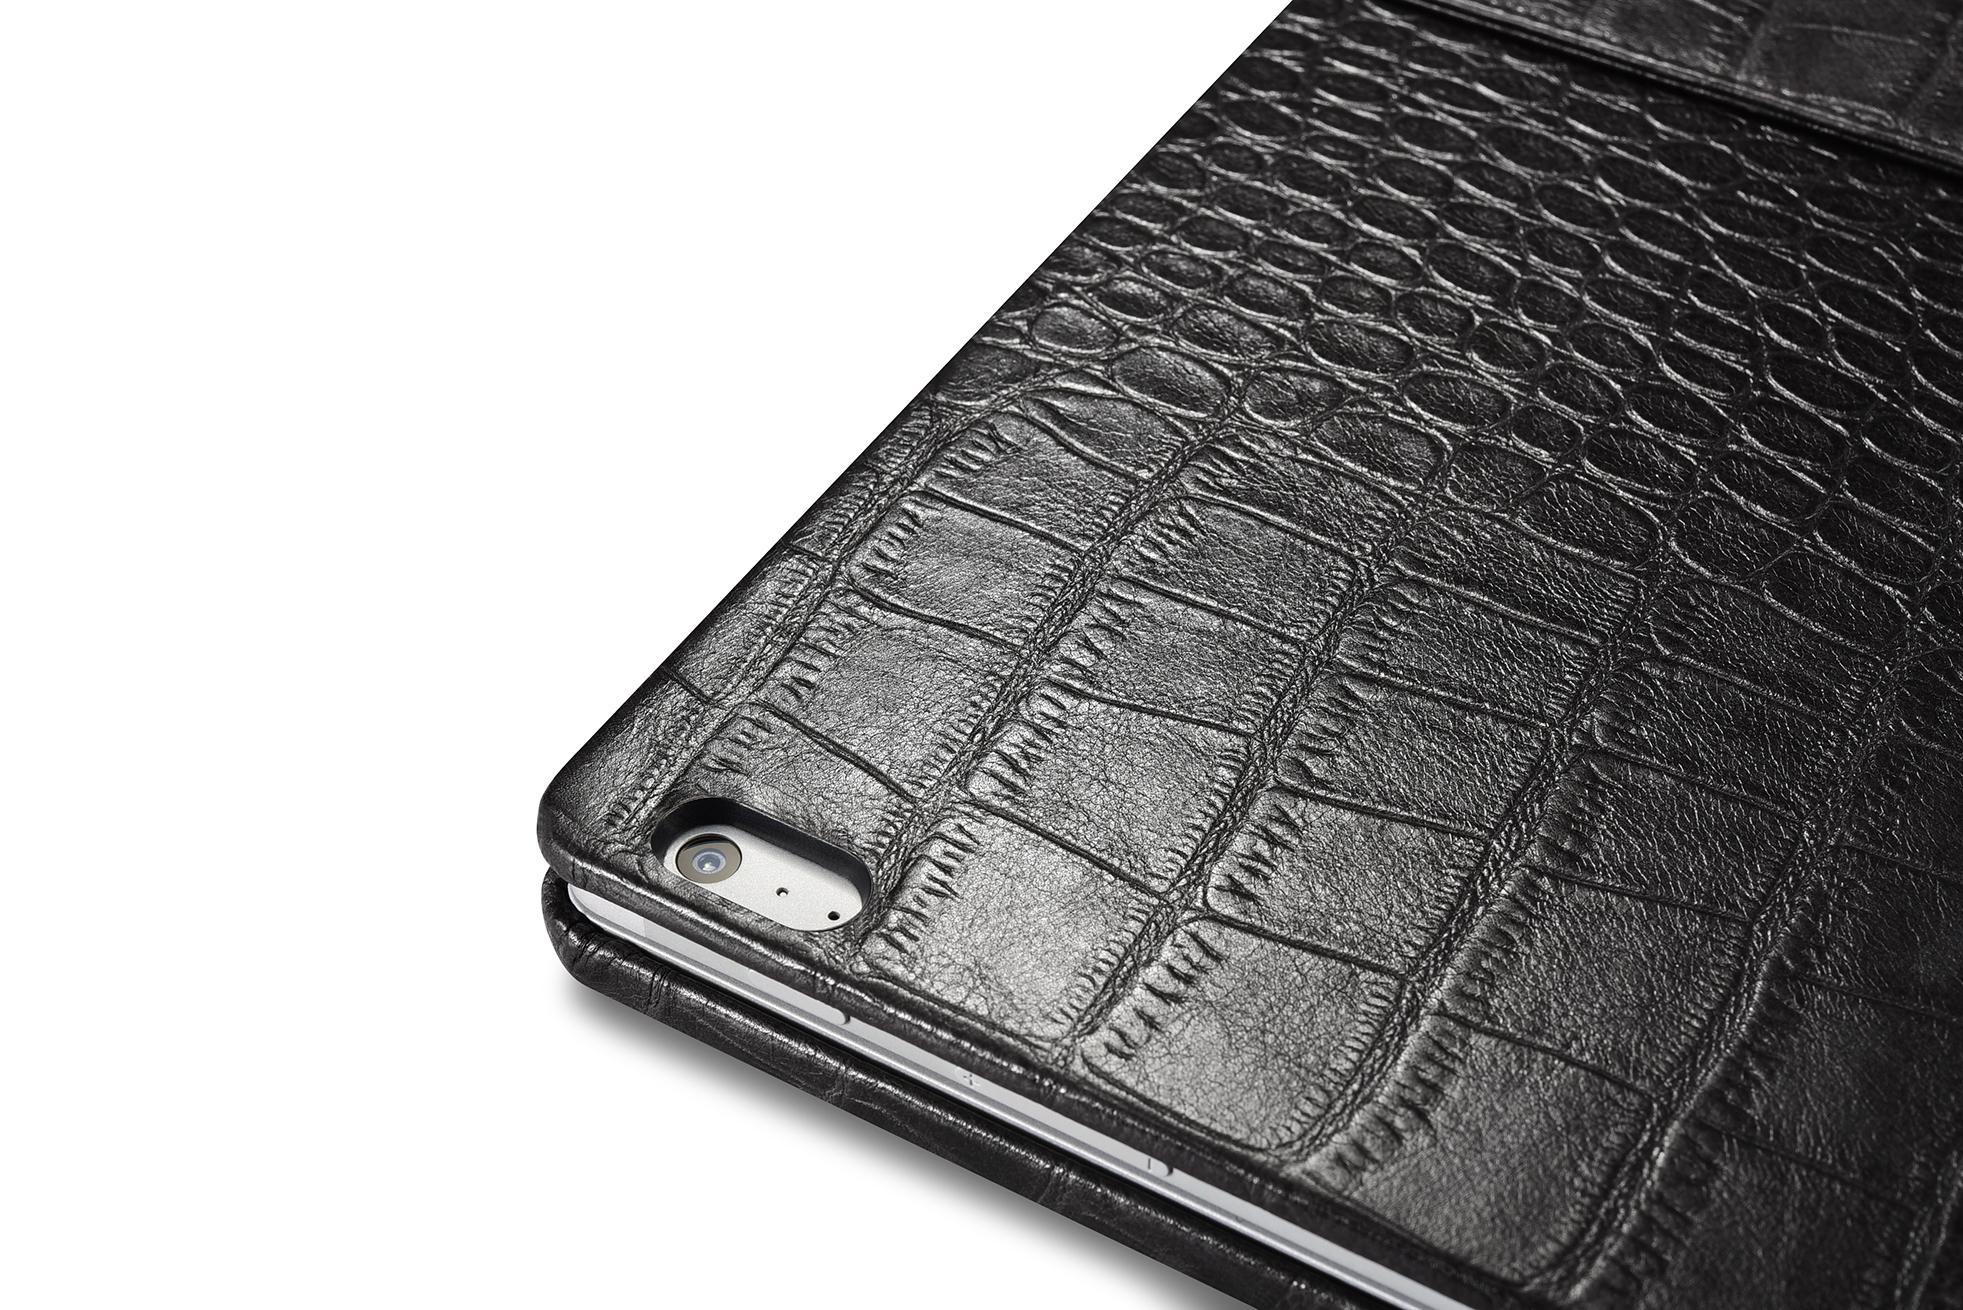 iCarer Surface Book Embossed Crocodile Genuine Leather Detachable Flip Case 17